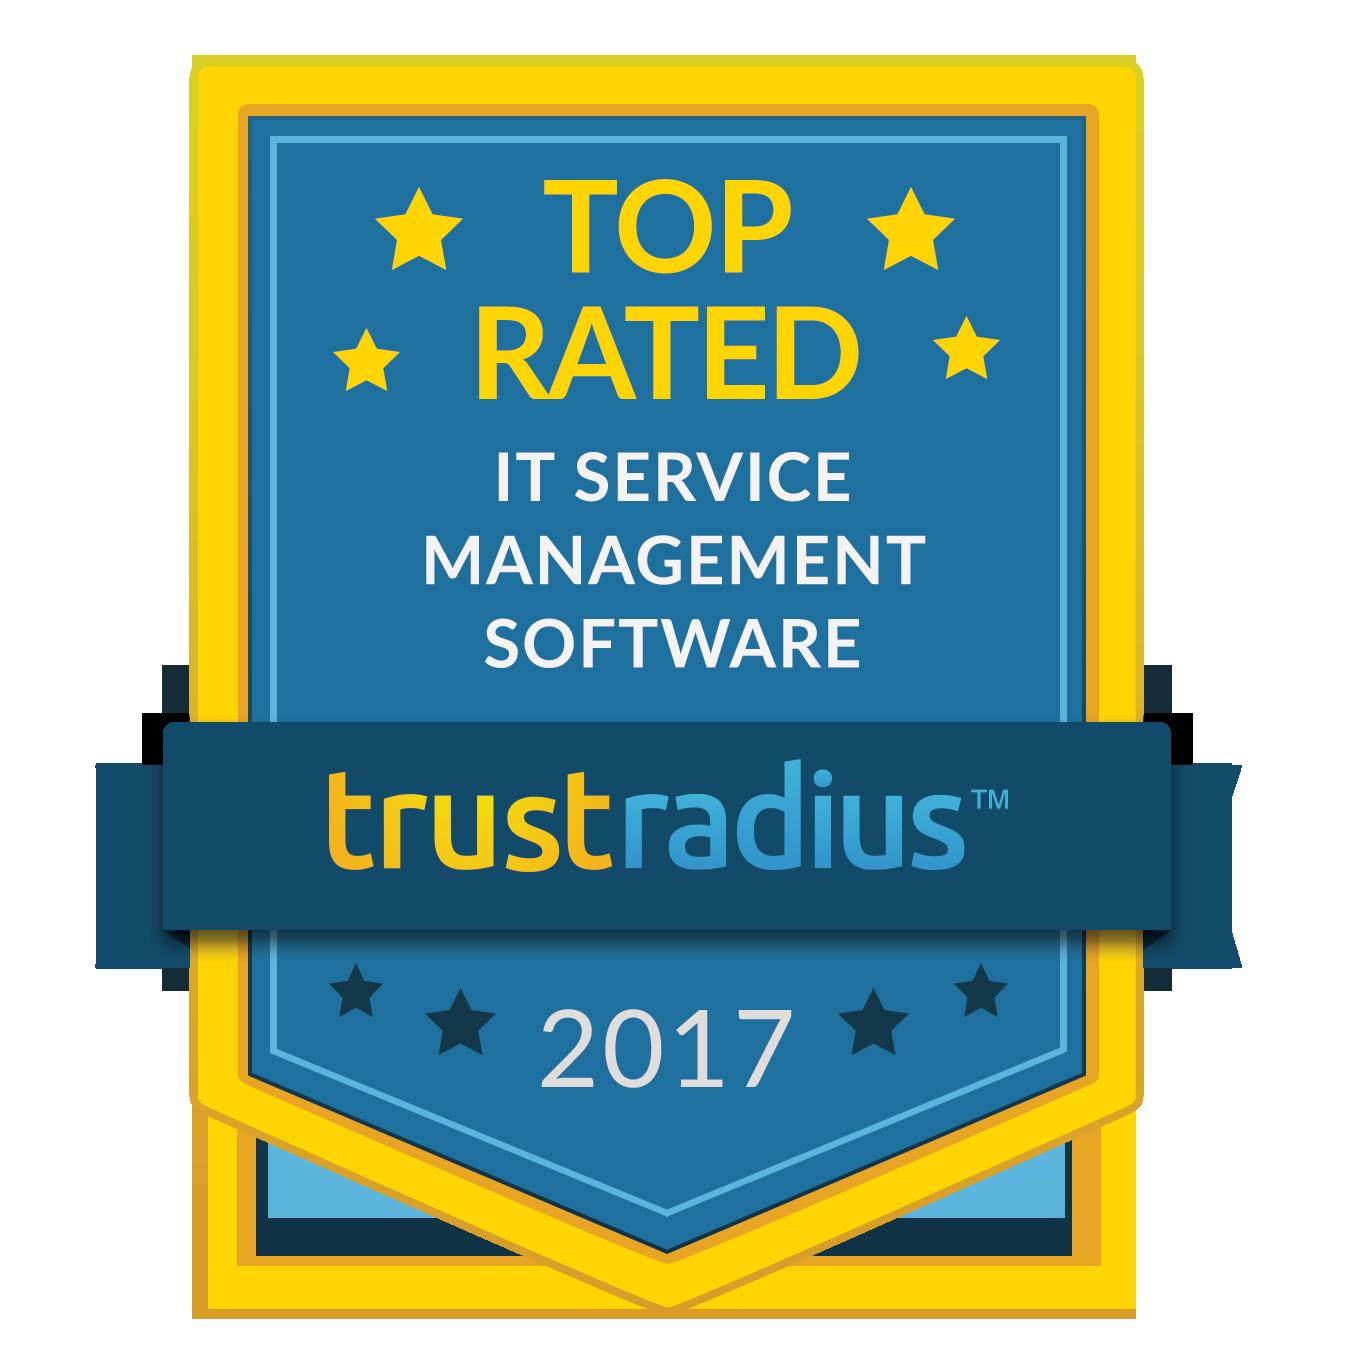 Trustradius Top Rated